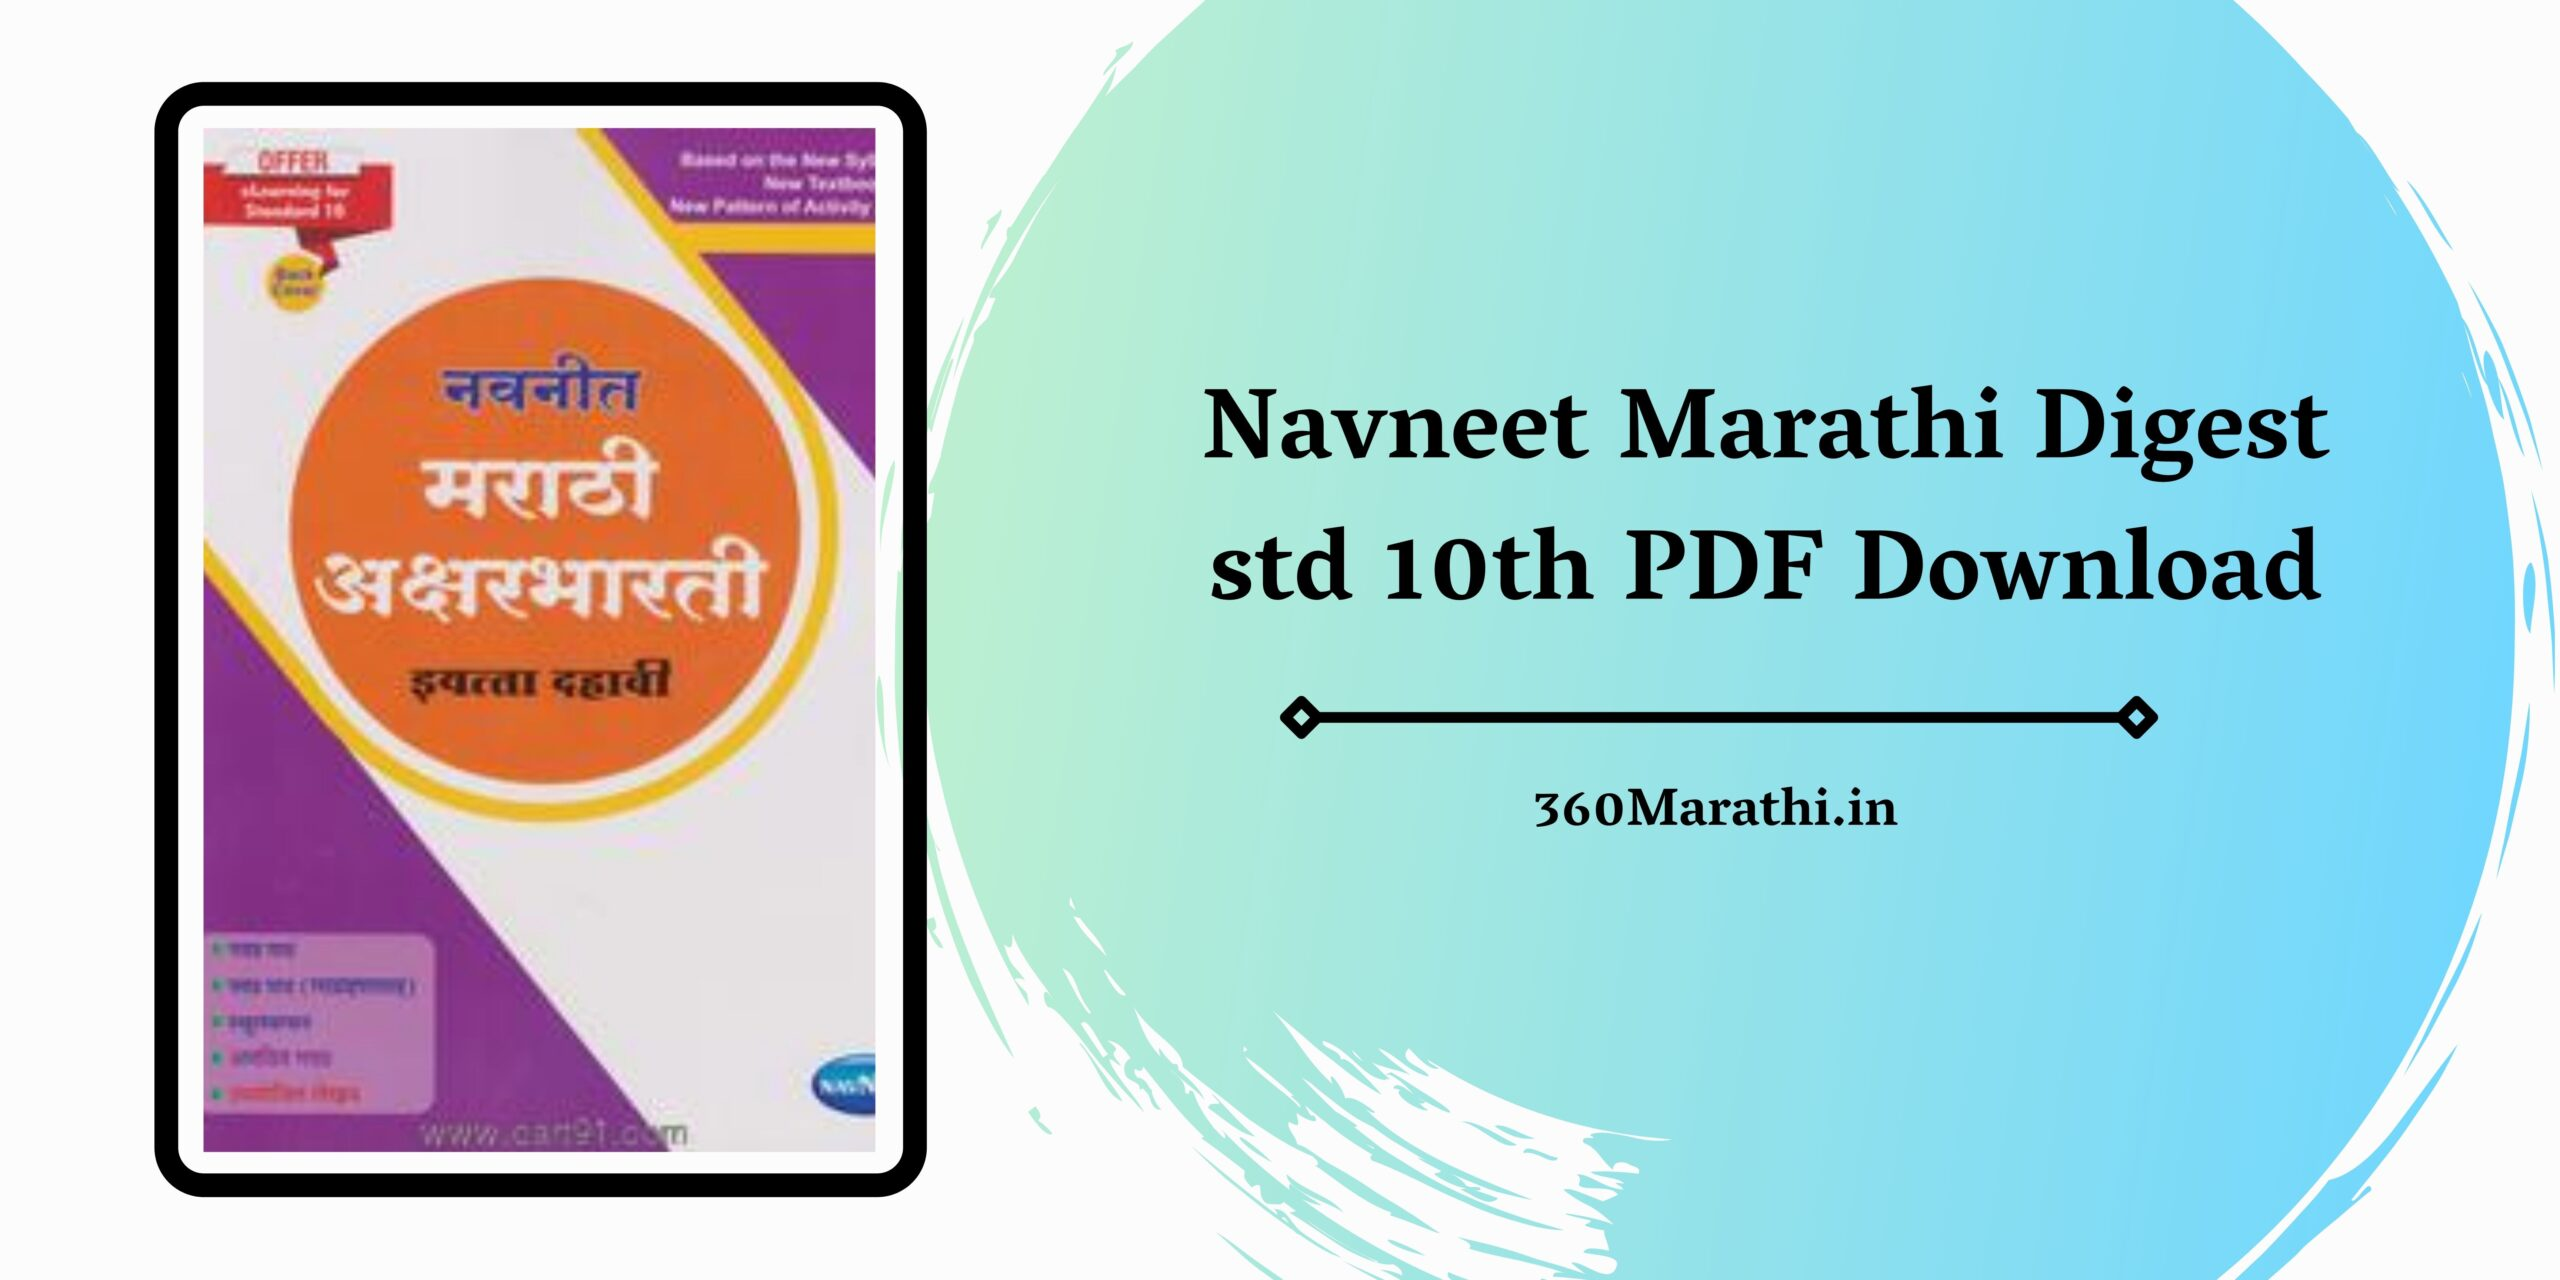 【FREE】Navneet Marathi Digest std 10th PDF Download